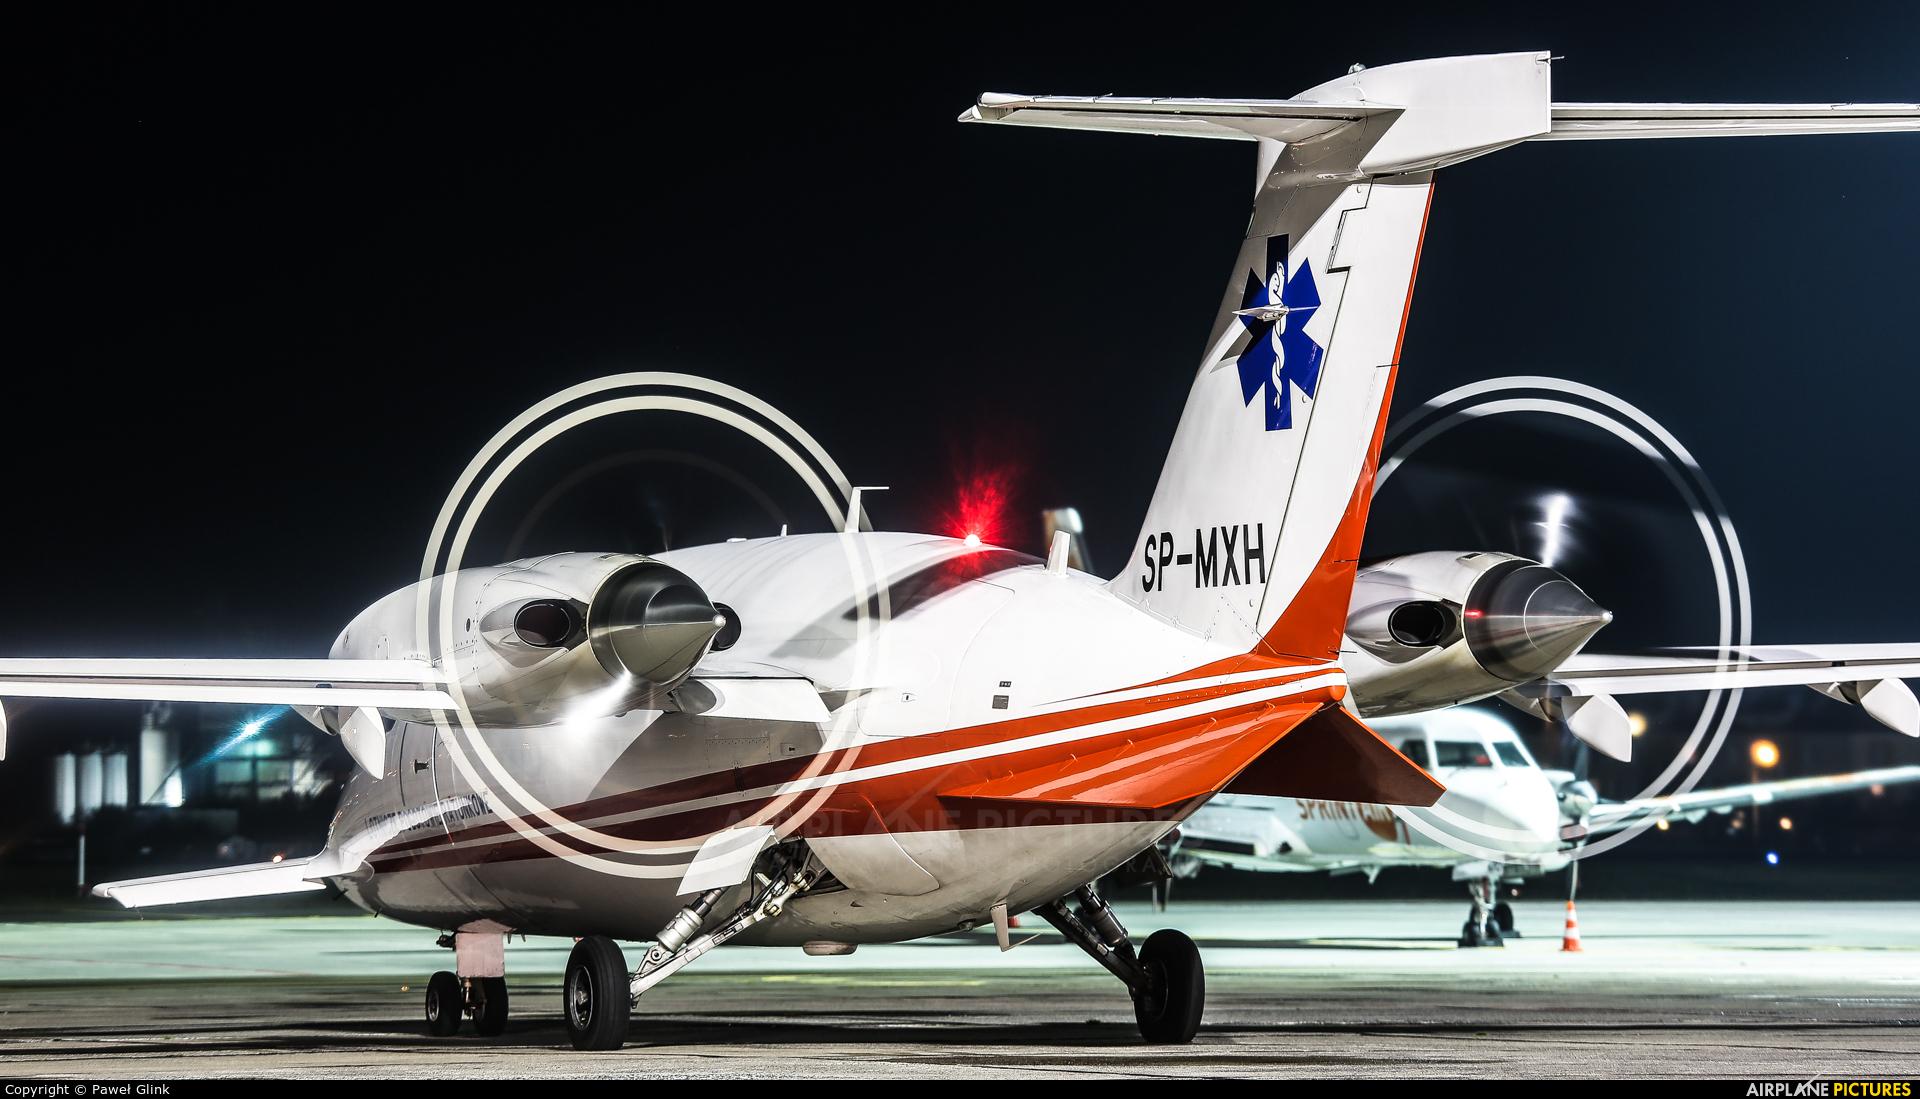 Polish Medical Air Rescue - Lotnicze Pogotowie Ratunkowe SP-MXH aircraft at Gdańsk - Lech Wałęsa